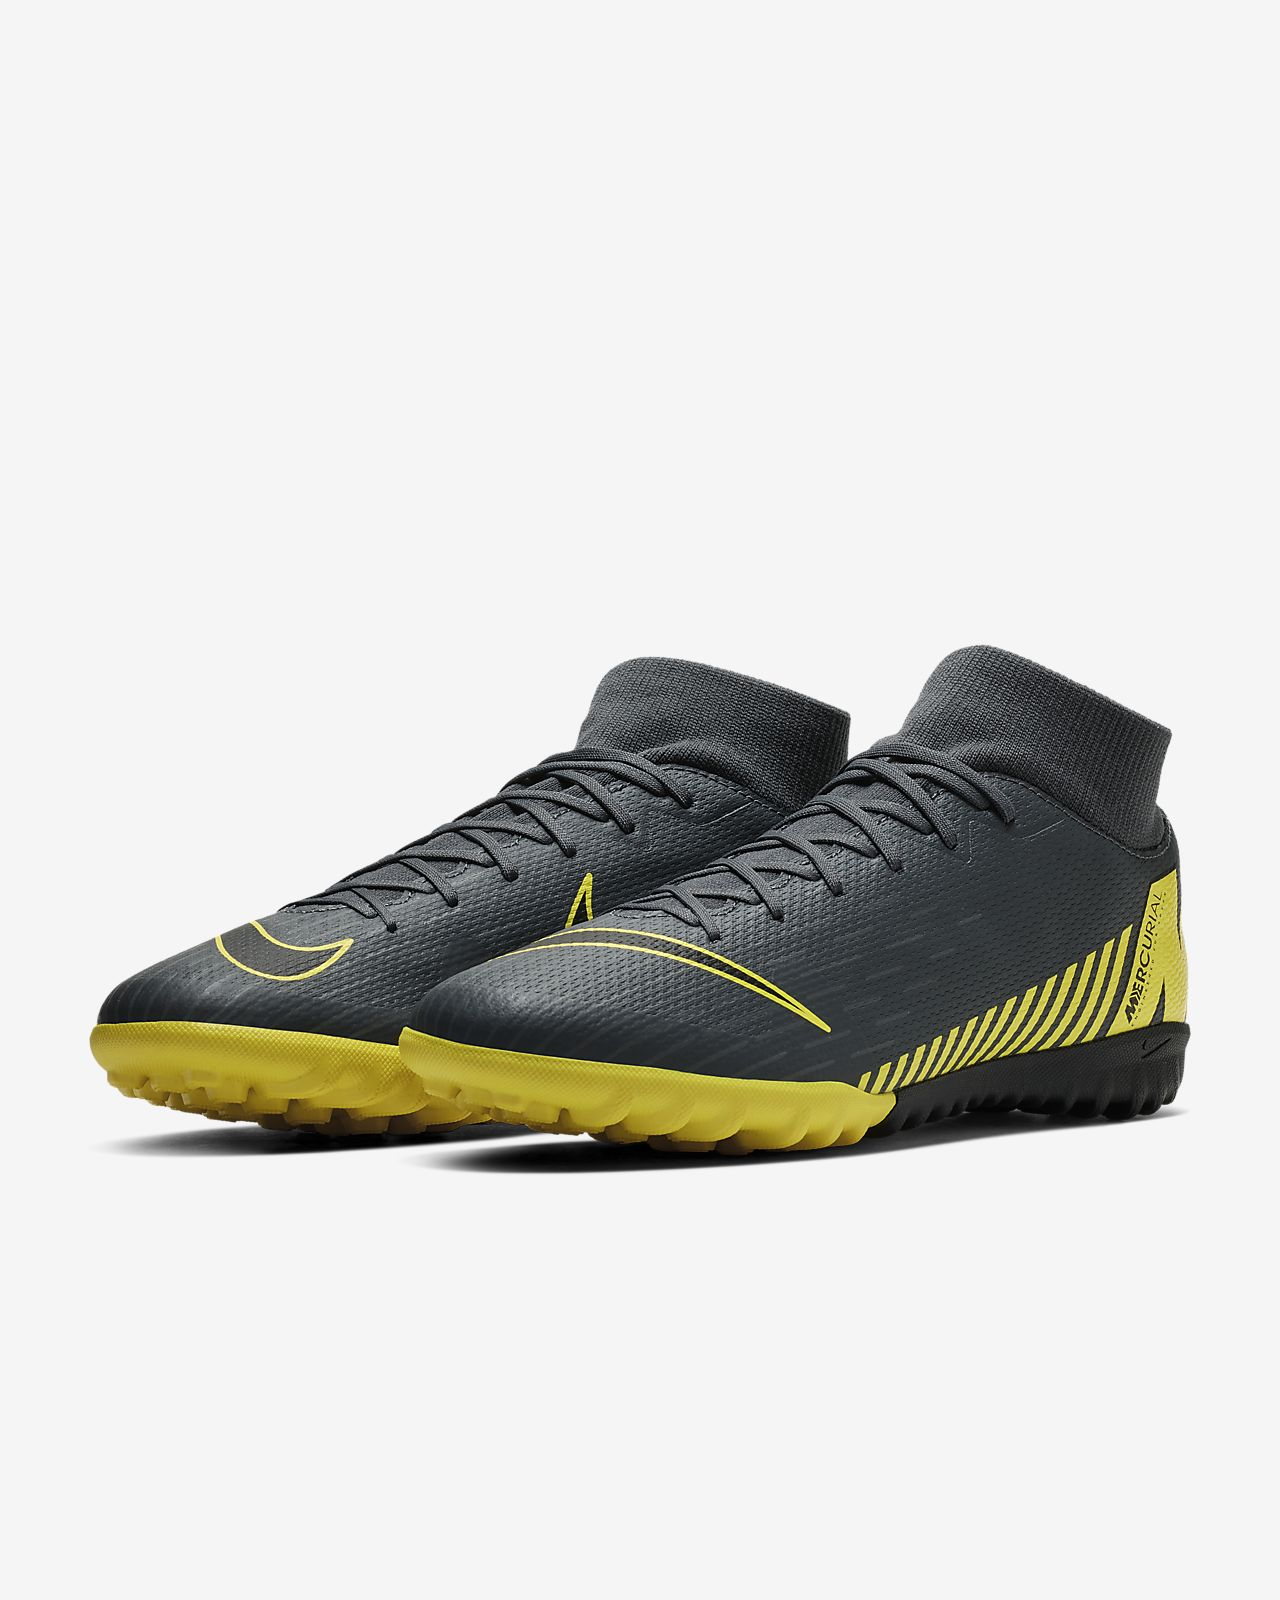 63595eafa9253 Nike SuperflyX 6 Academy TF Turf Football Boot. Nike.com IL